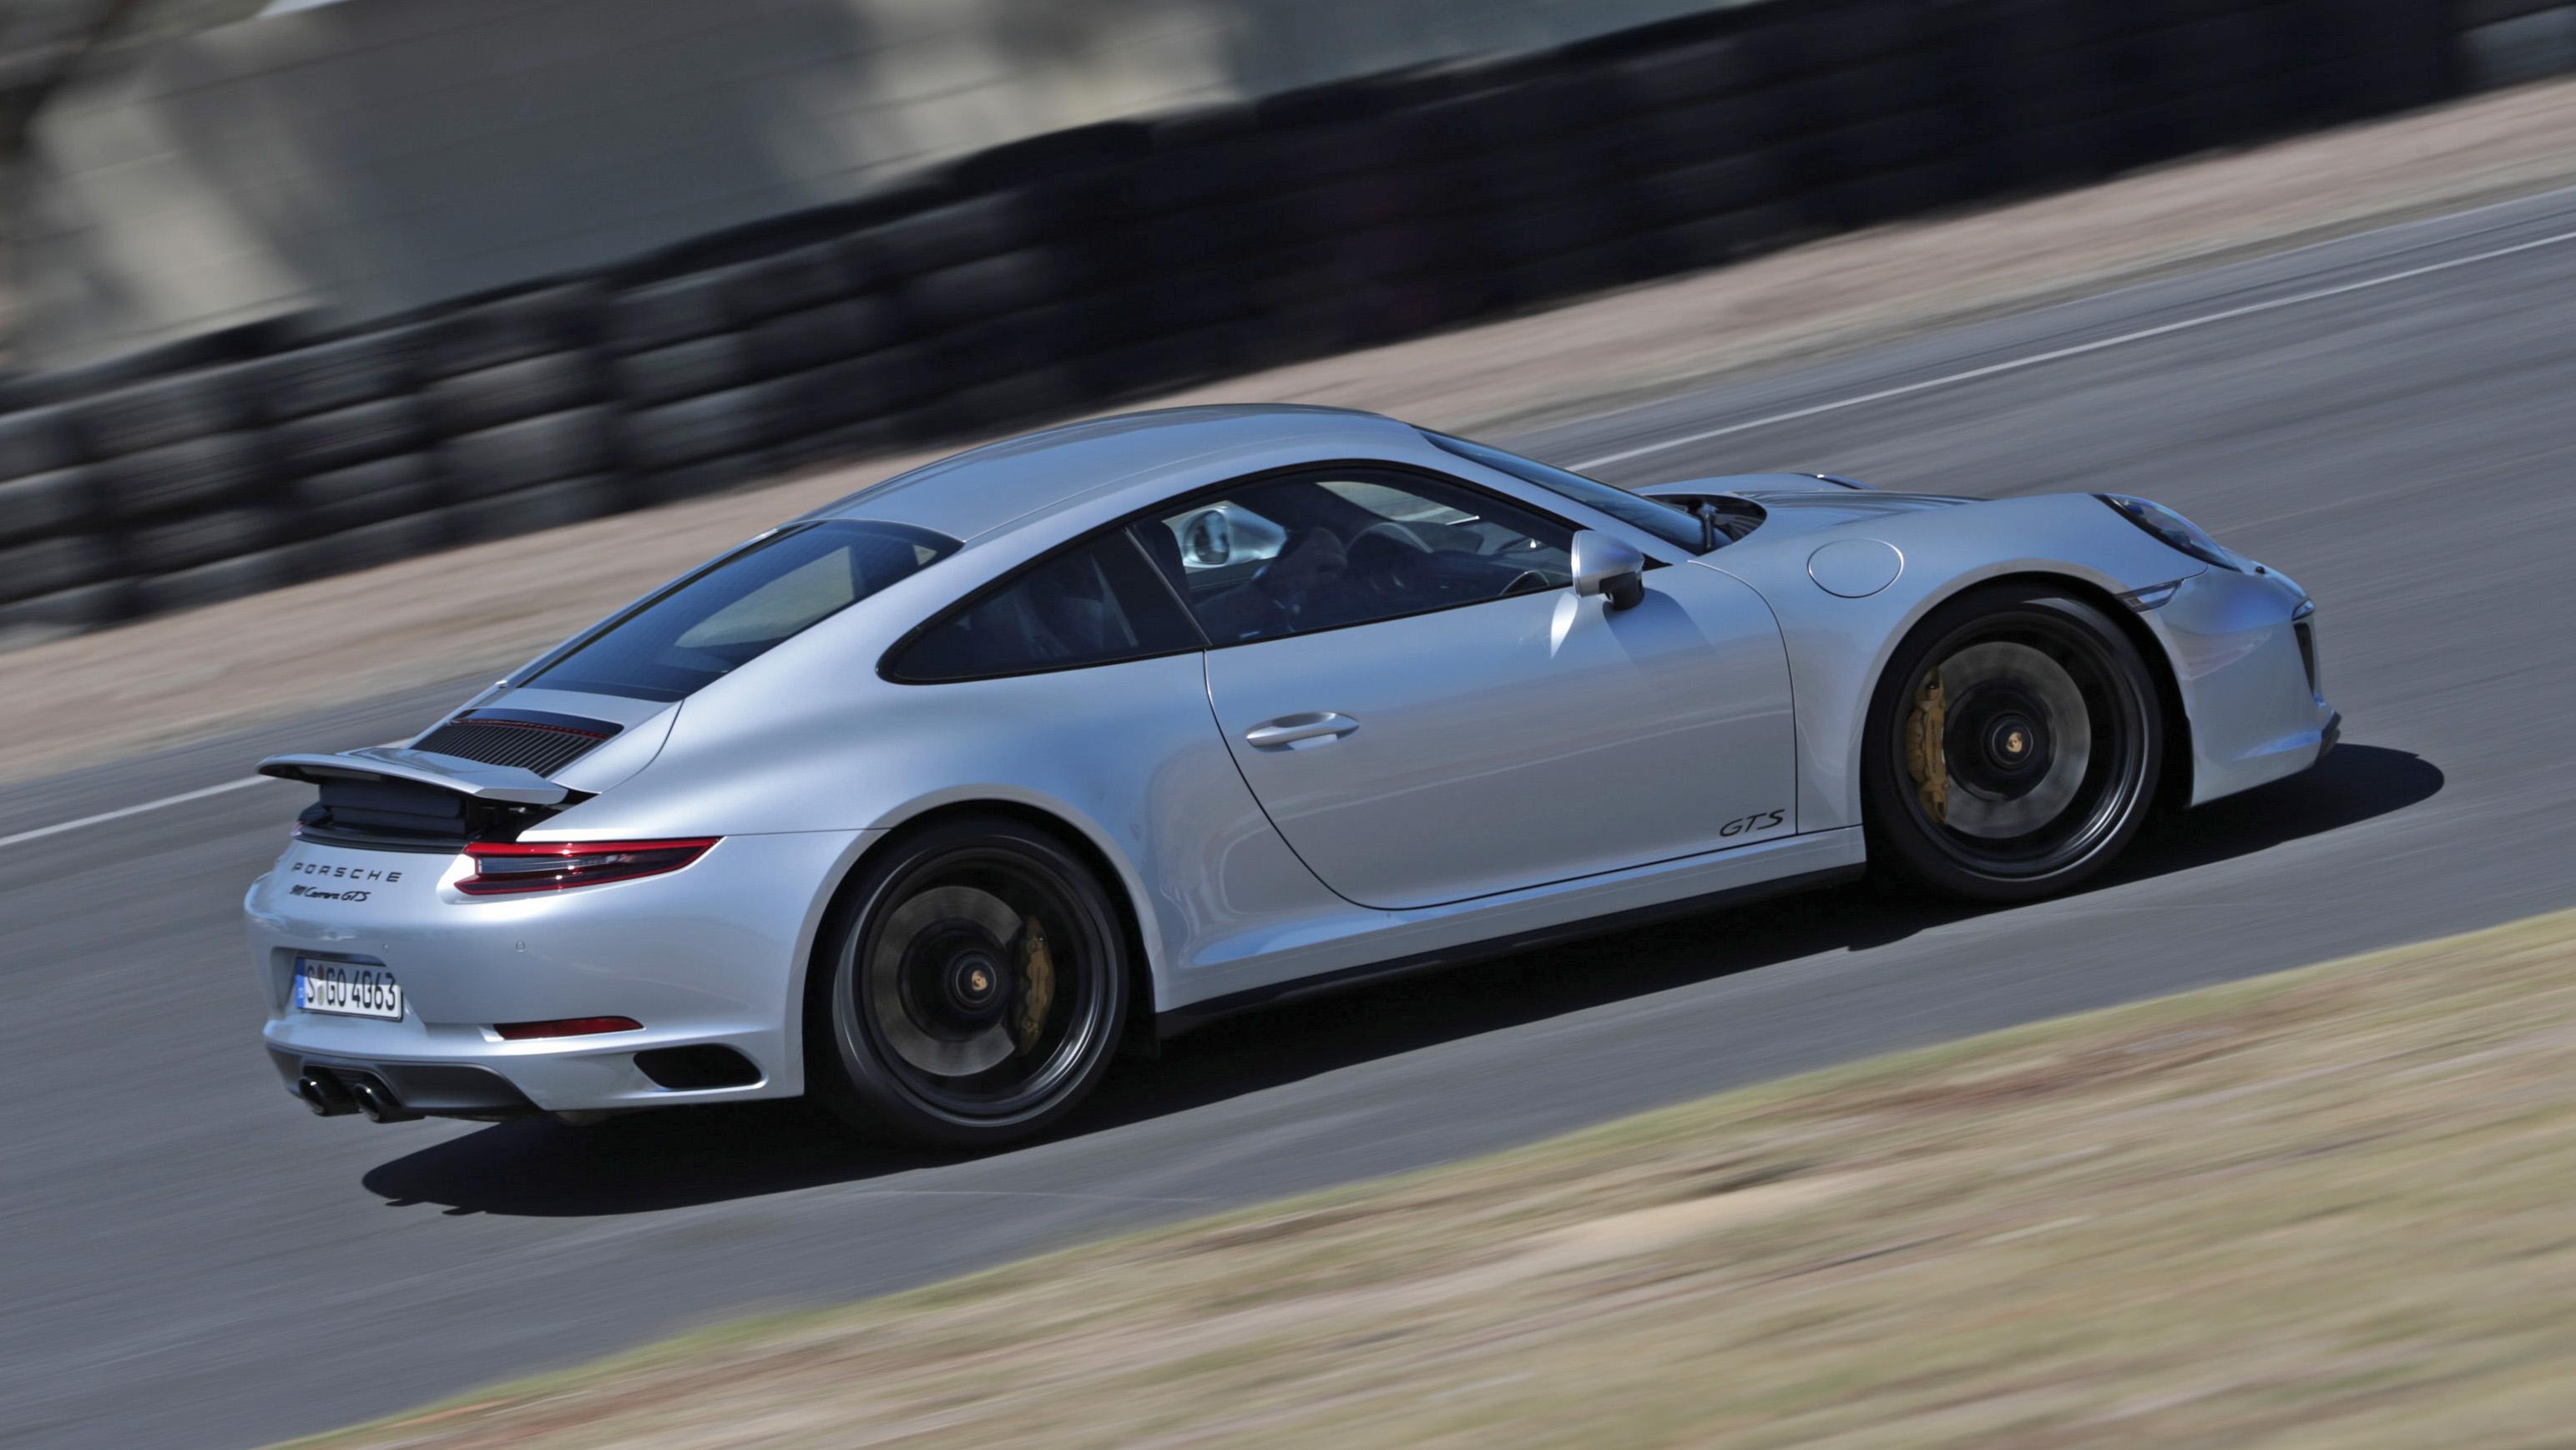 Porsche 911 GTS side